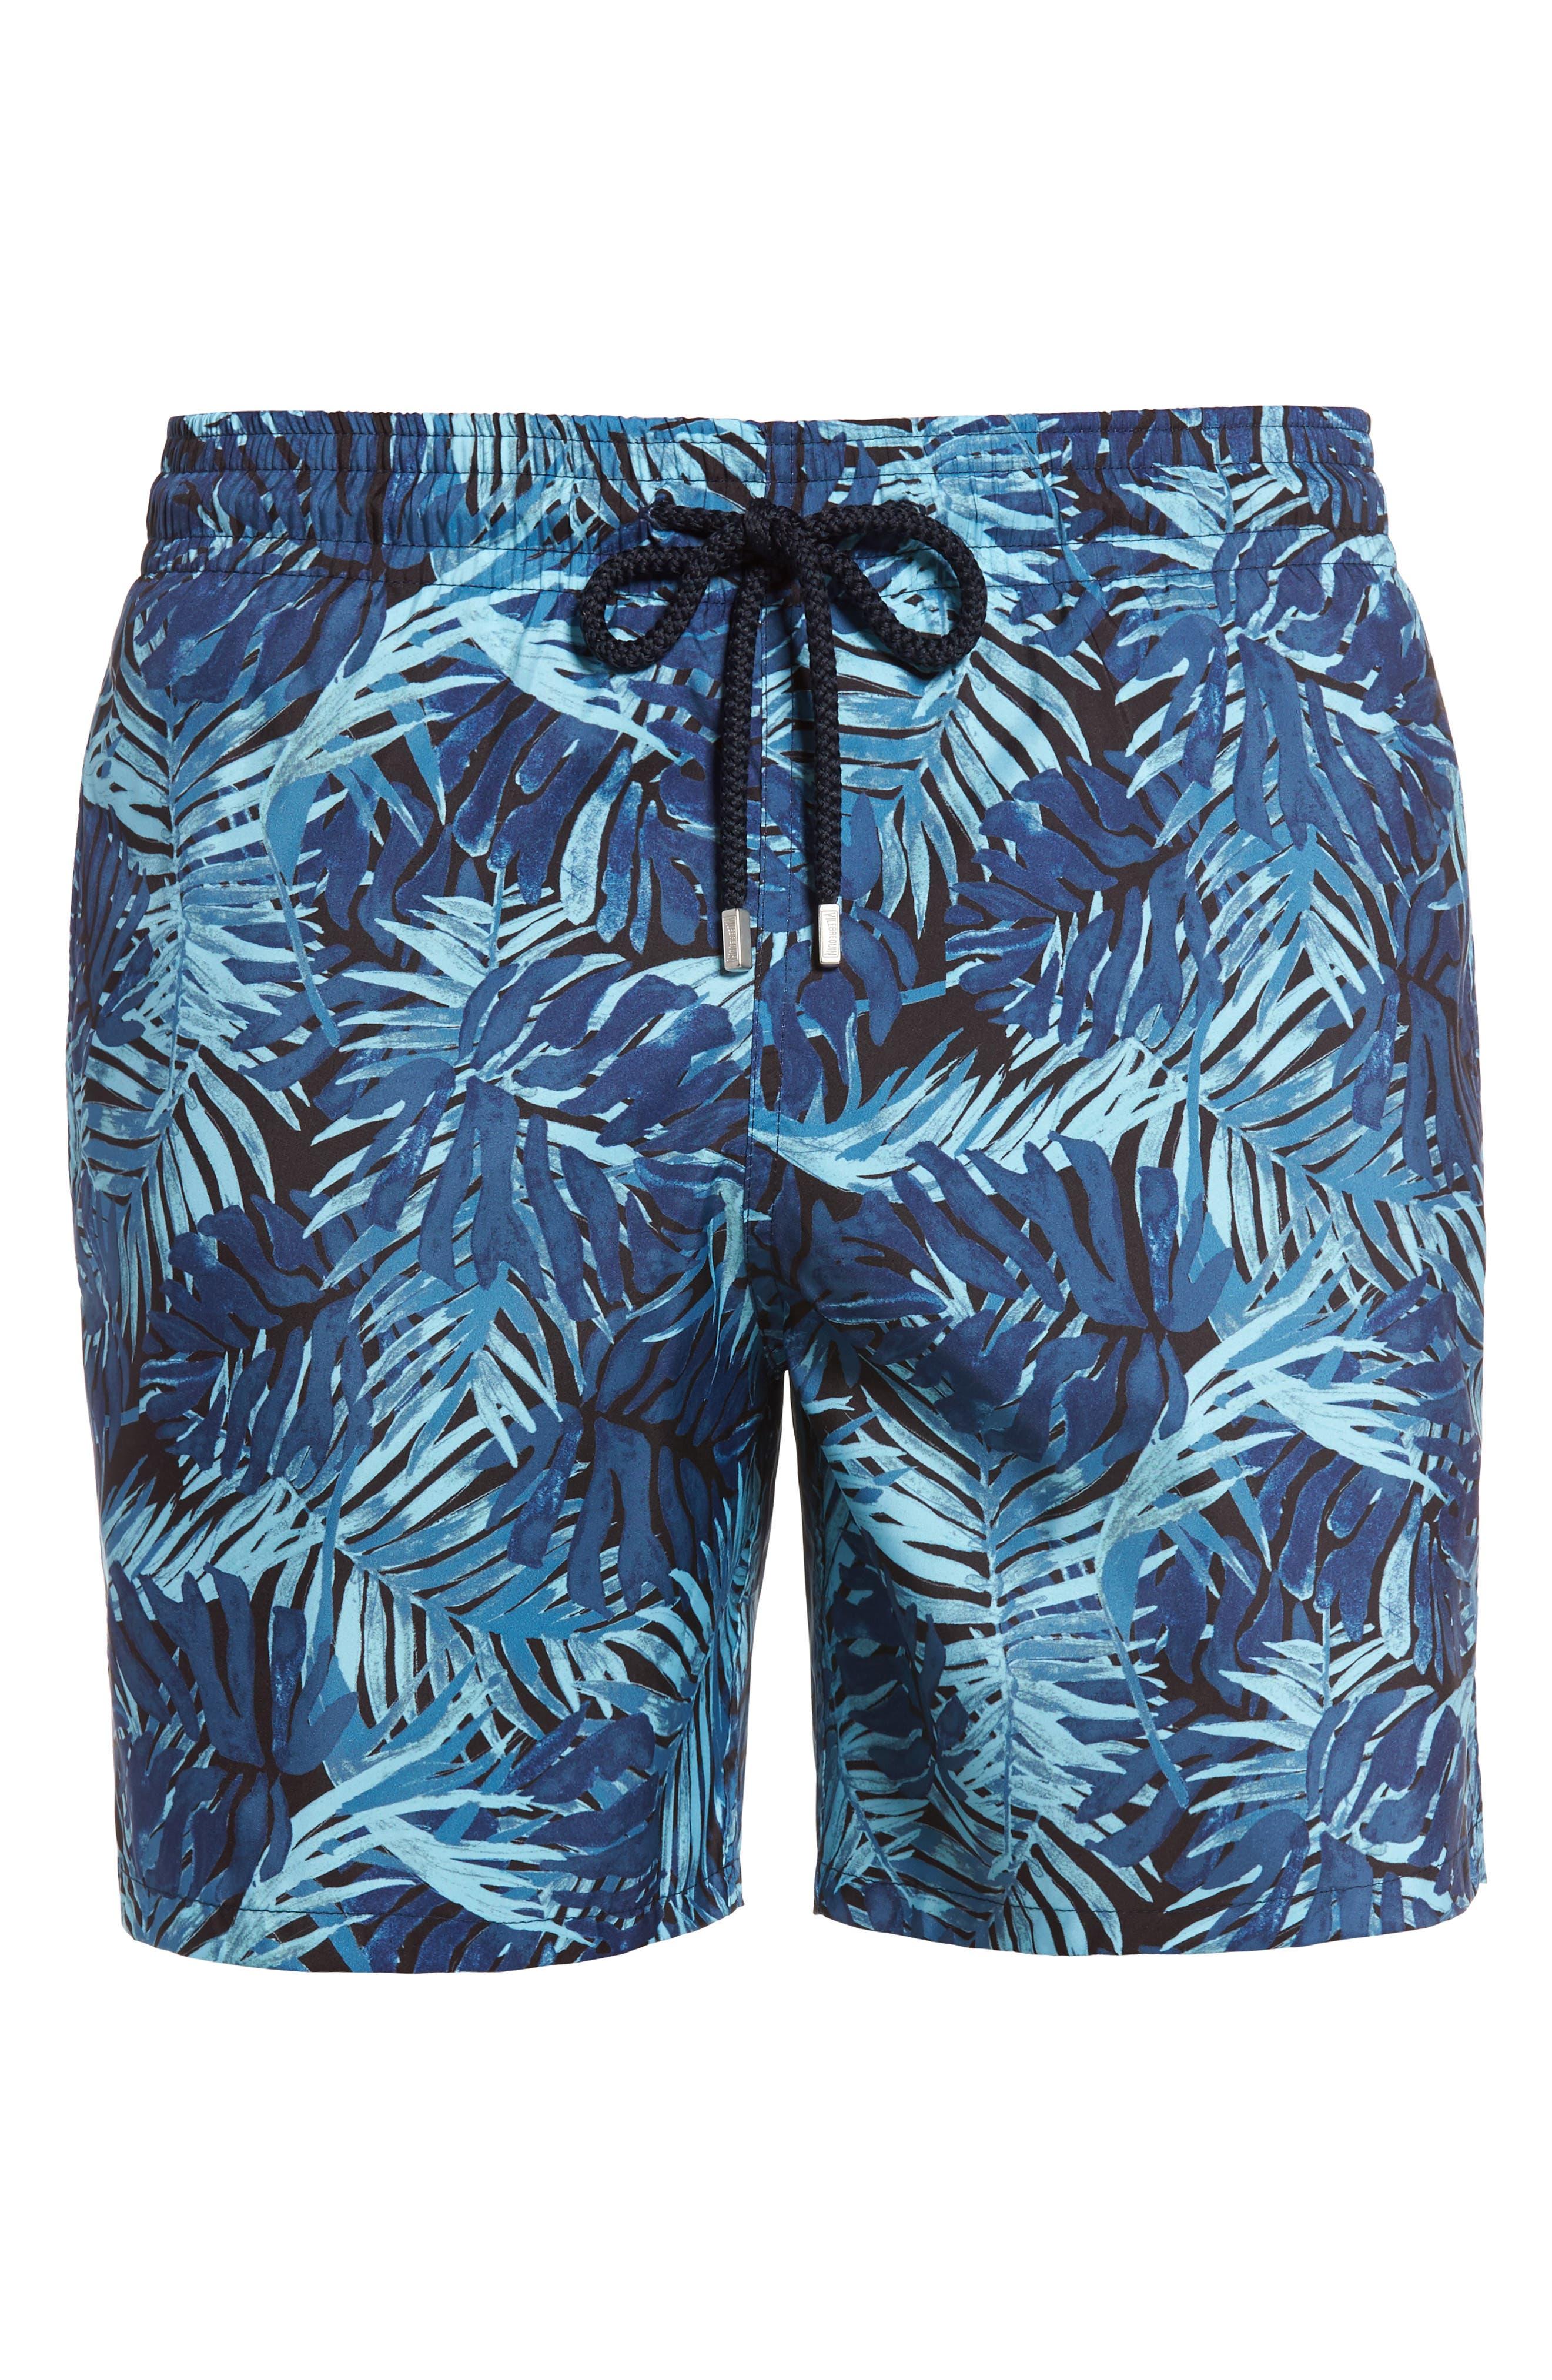 Mahina Madrague Print Packable Swim Trunks,                             Alternate thumbnail 6, color,                             Navy Blue